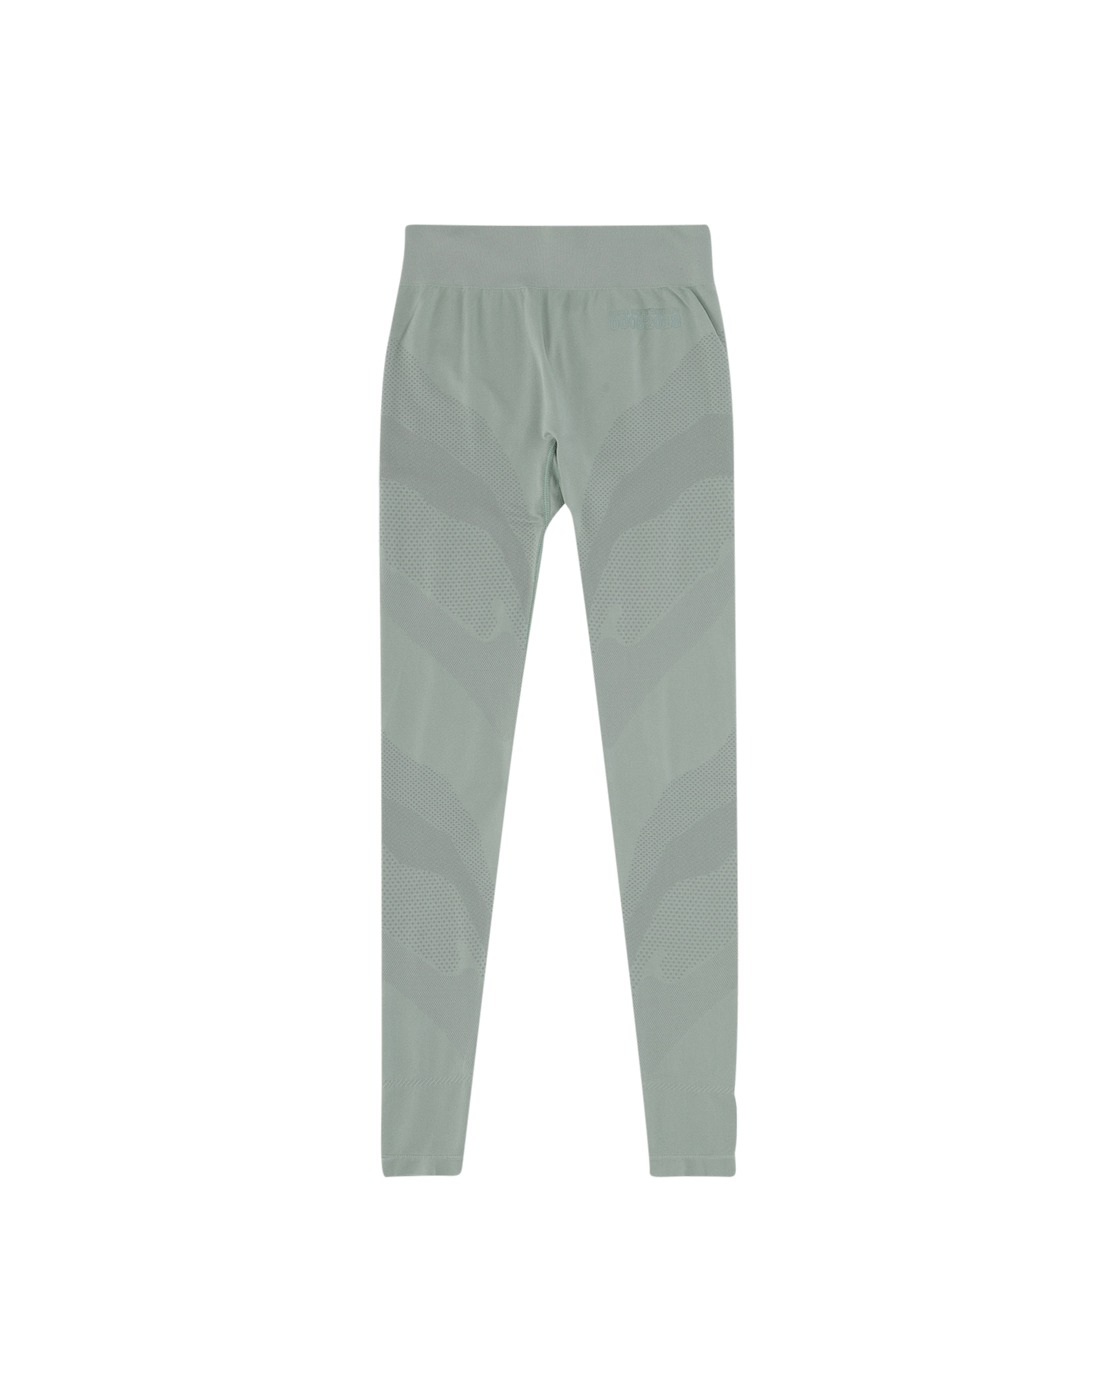 Asics Kiko Seamless Tight Slate Grey